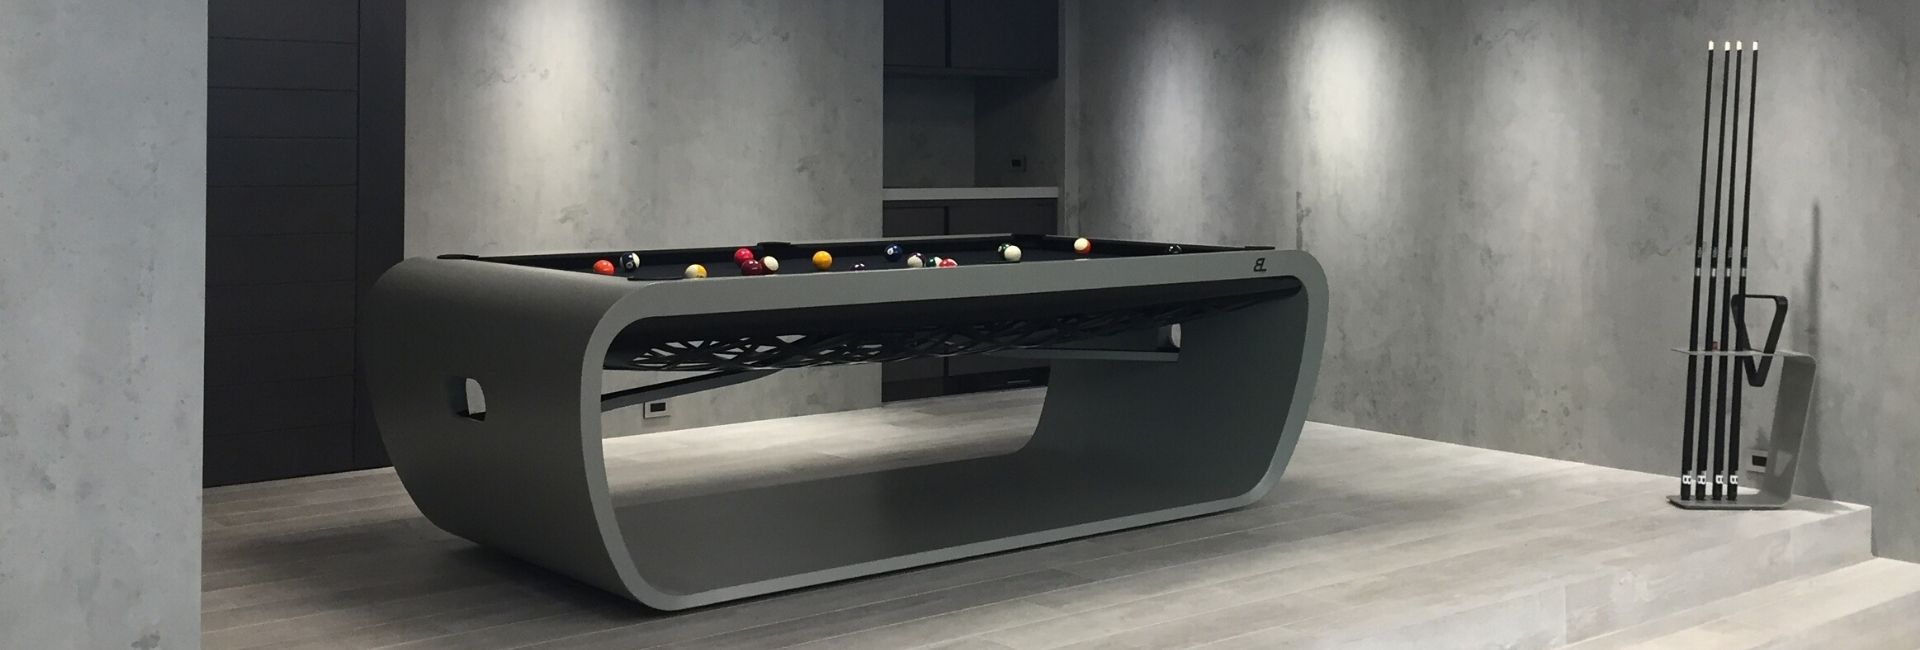 Billiard luxury - Blacklight - Billiards Toulet